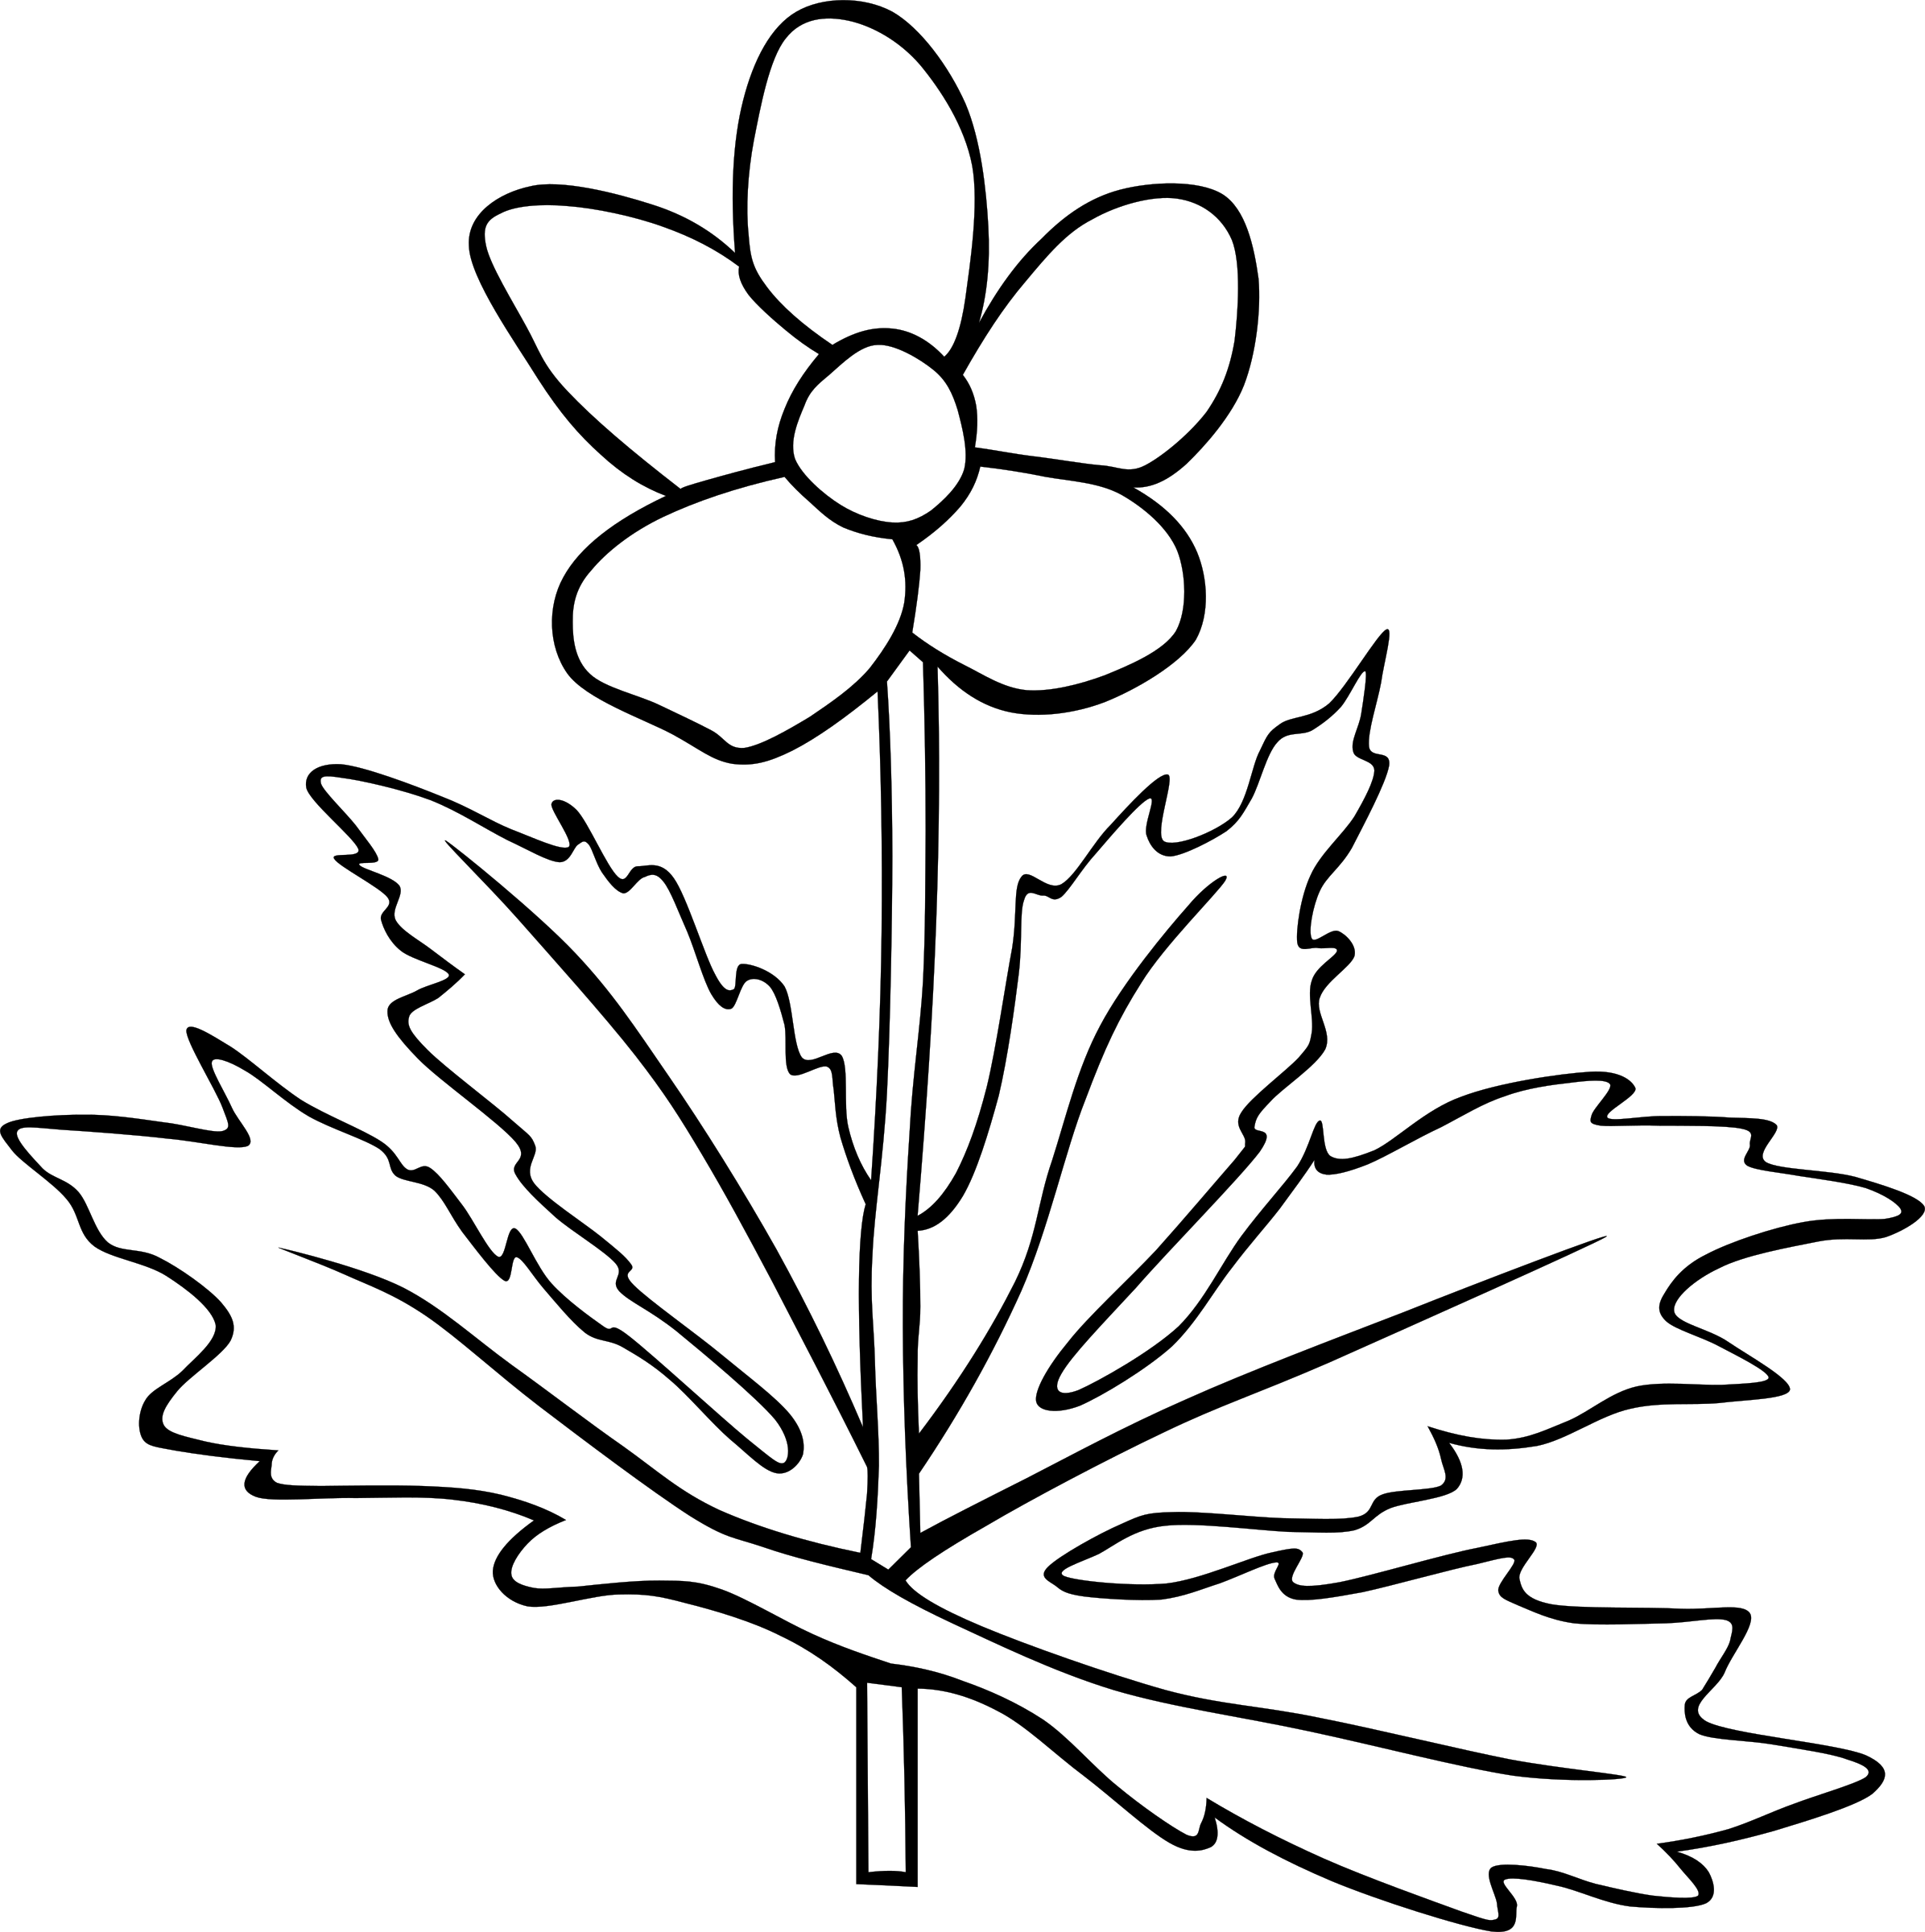 Flower outline clipart jpg transparent download Clipart - Anemone Canadensis Flower Outline jpg transparent download